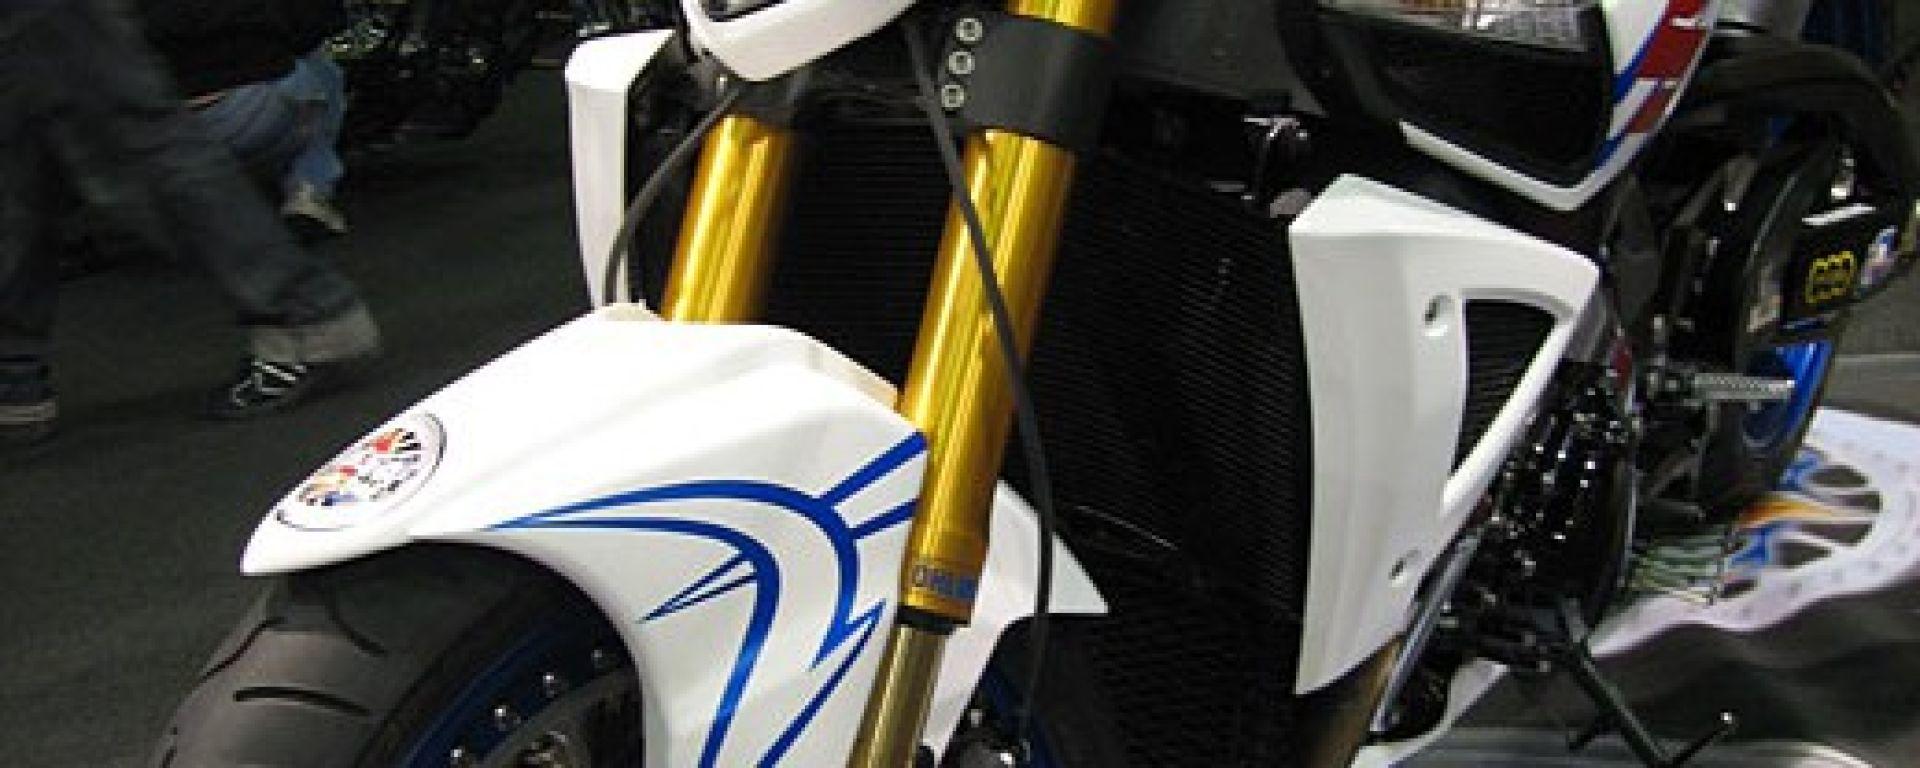 La gallery delle moto